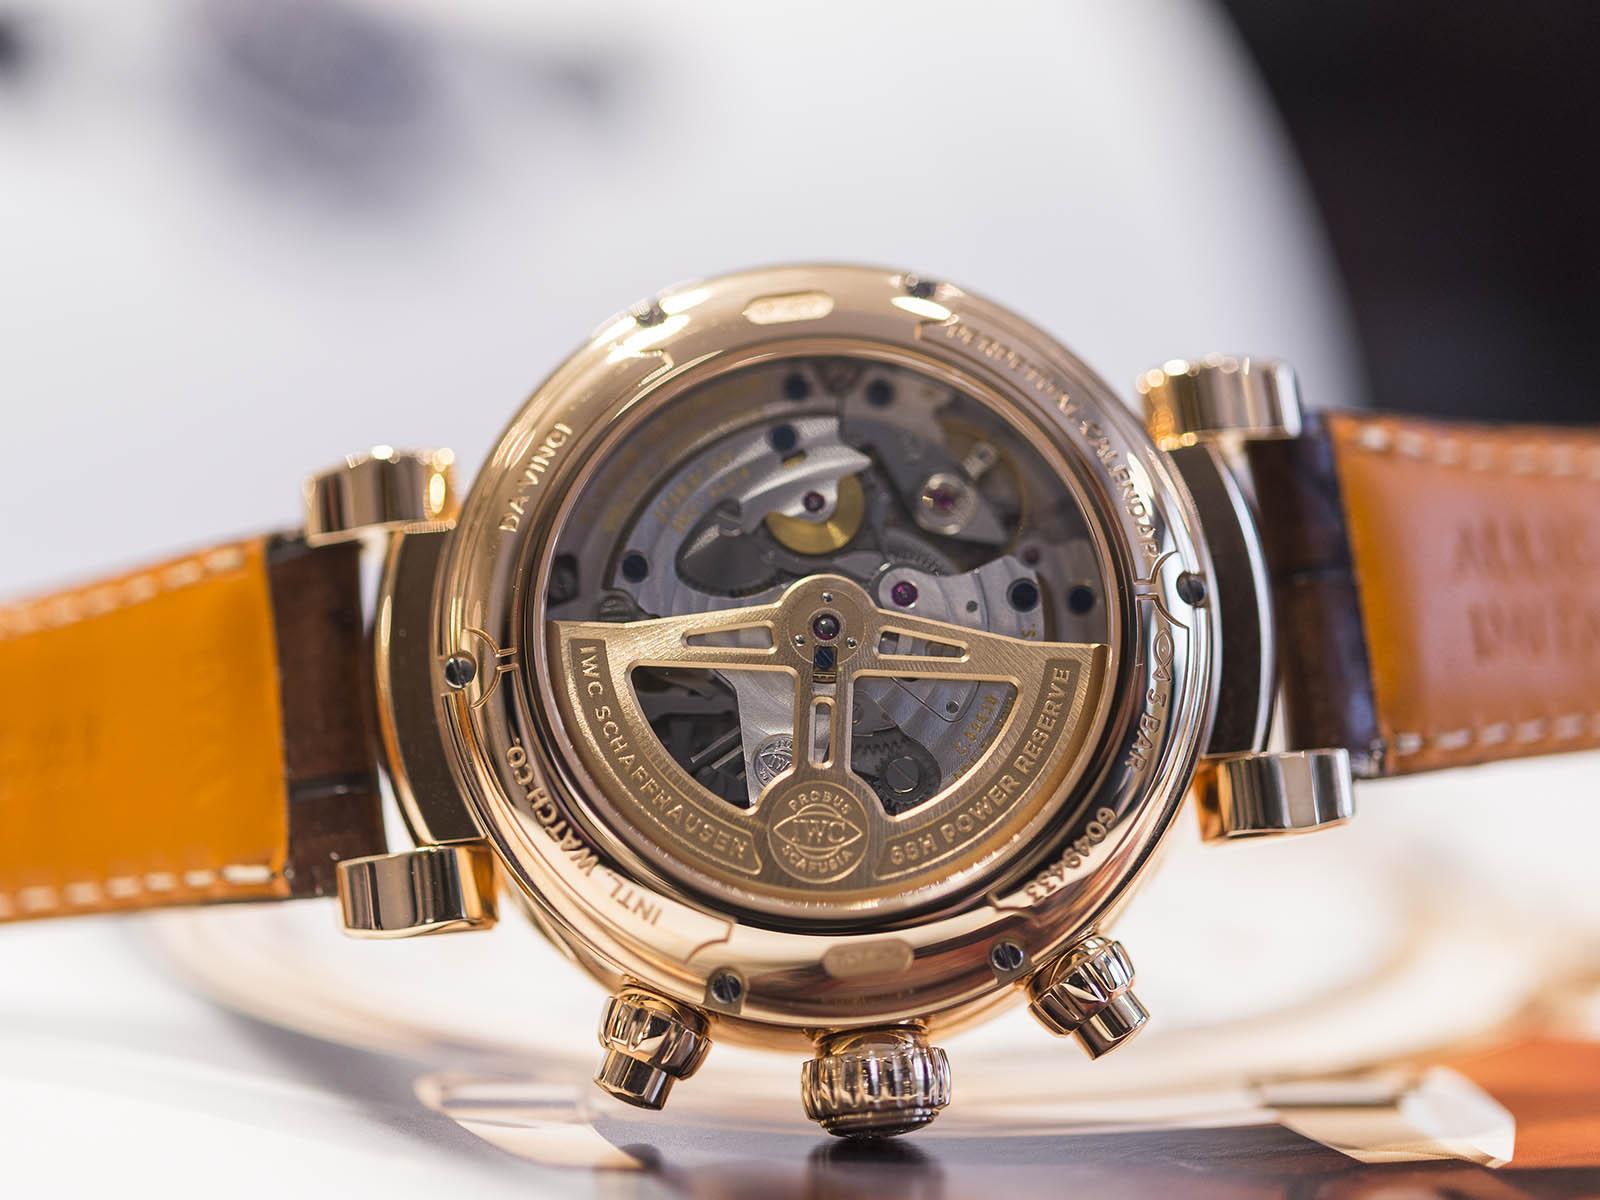 iwc-da-vinci-perpetual-calendar-chronograph-iw392101-6-.jpg